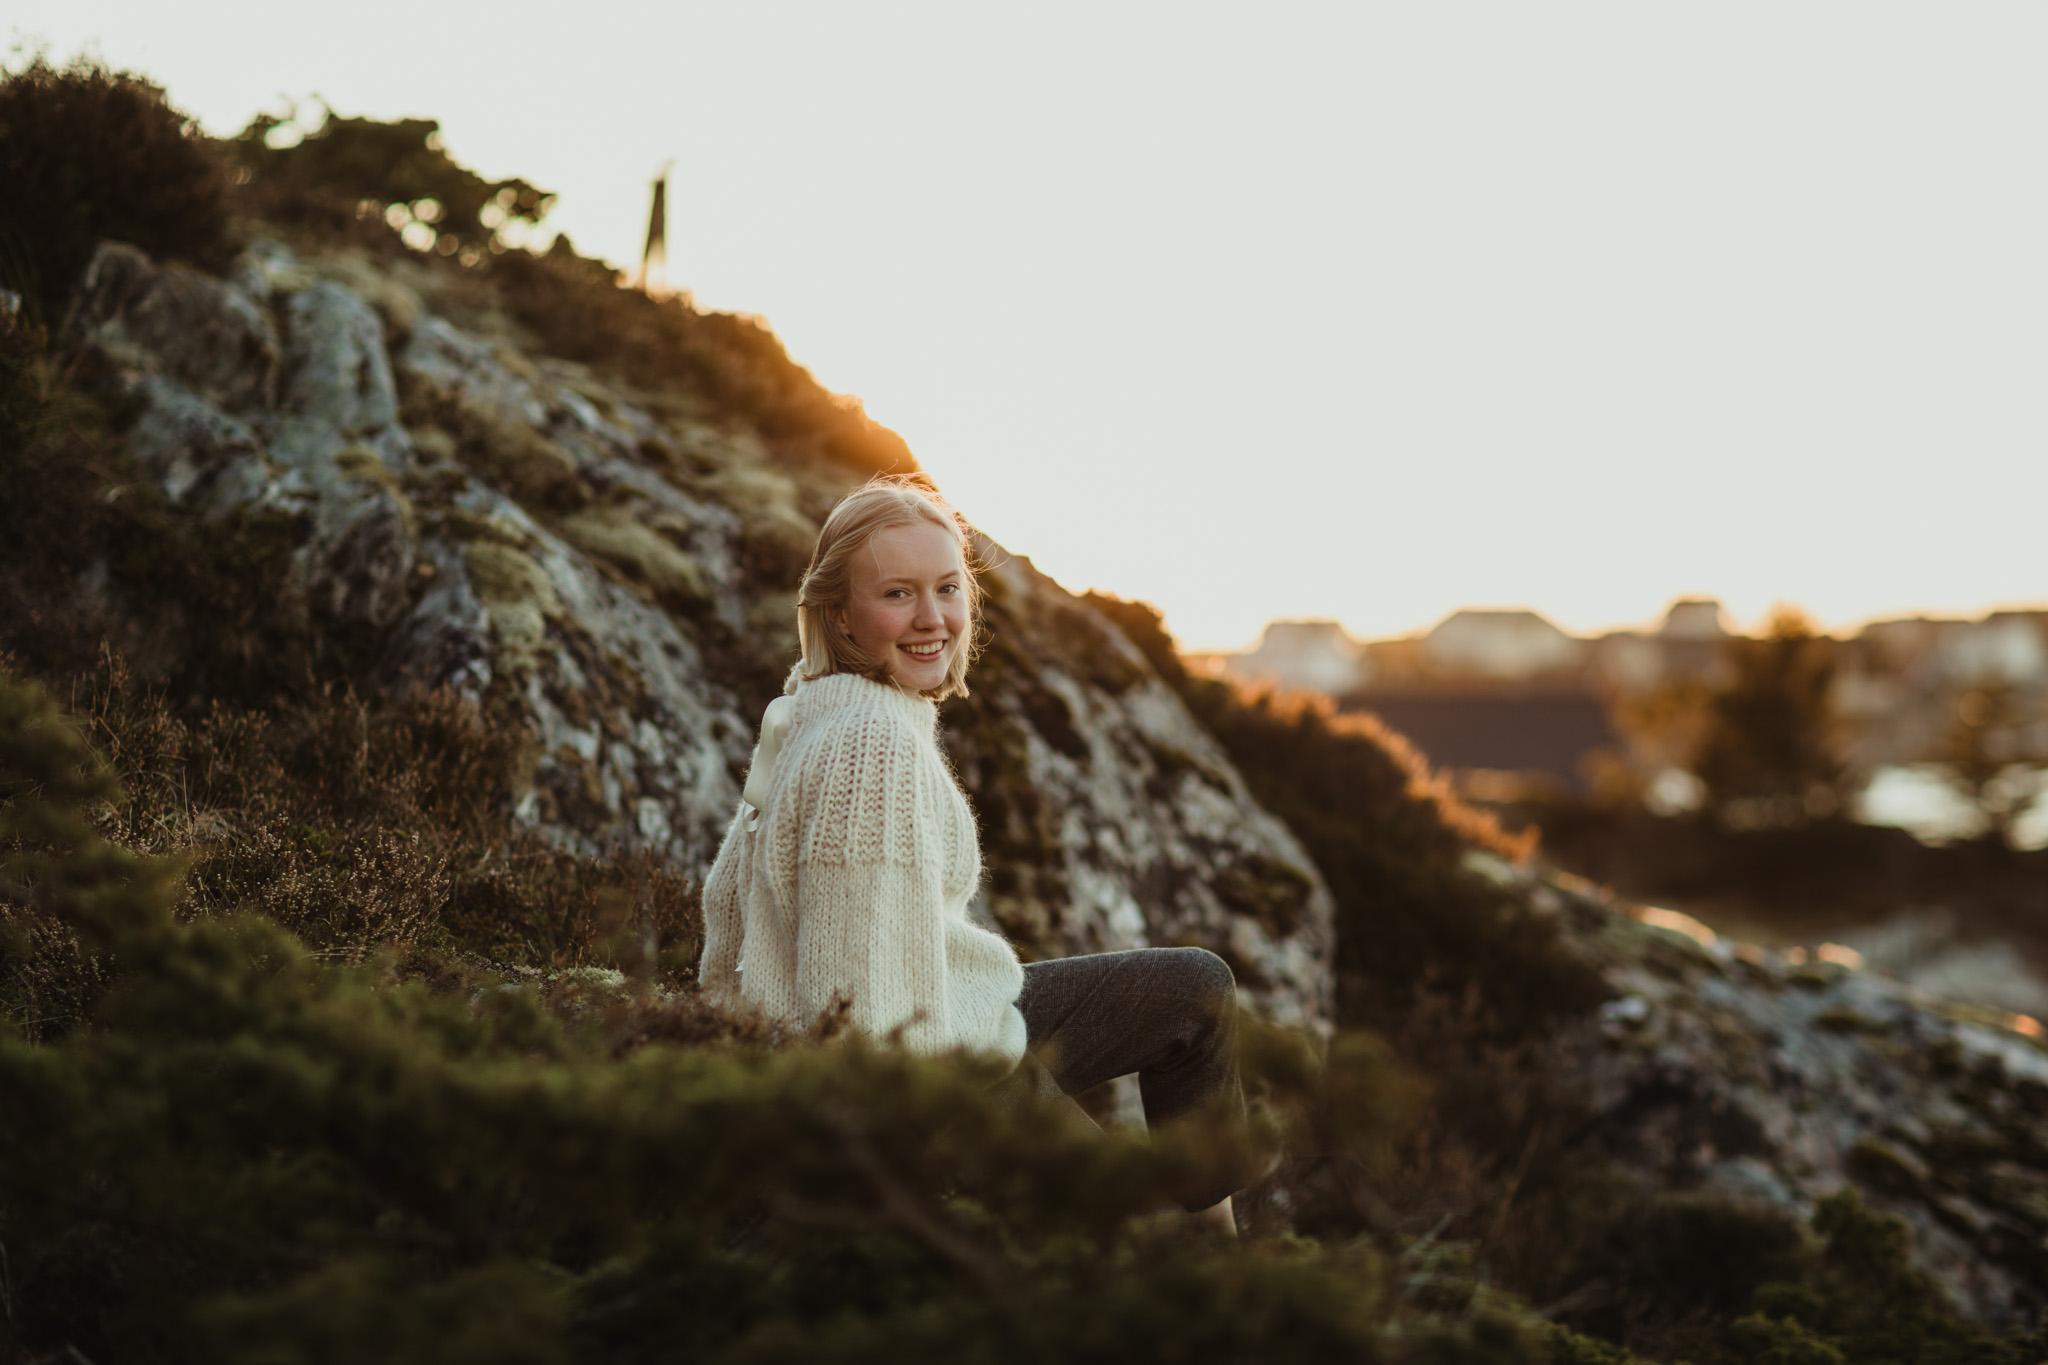 Konfirmasjonsfoto - jente i natur - Fotograf Ida Hvattum